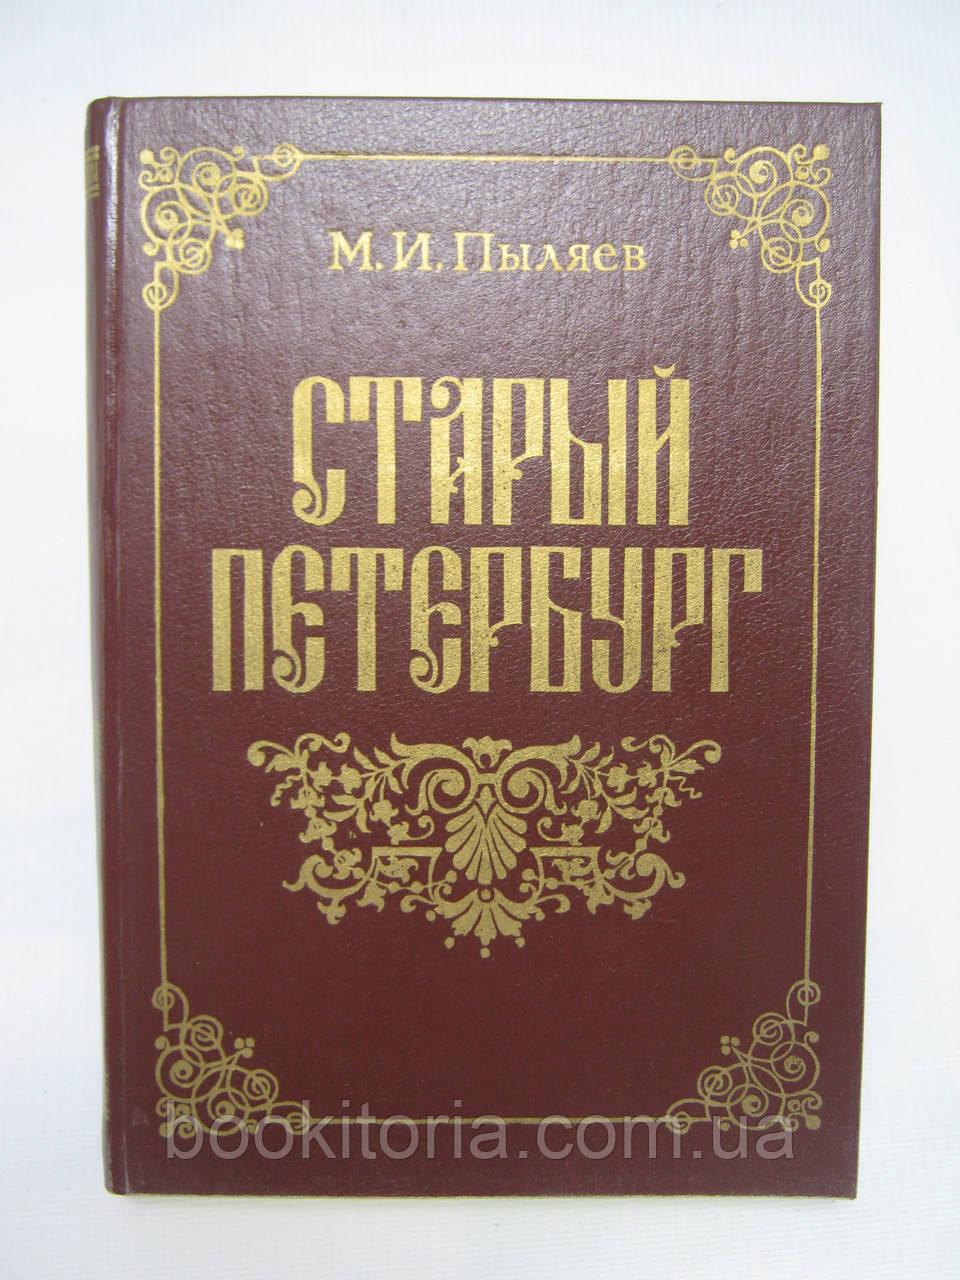 Пыляев М.И. Старый Петербург (б/у).